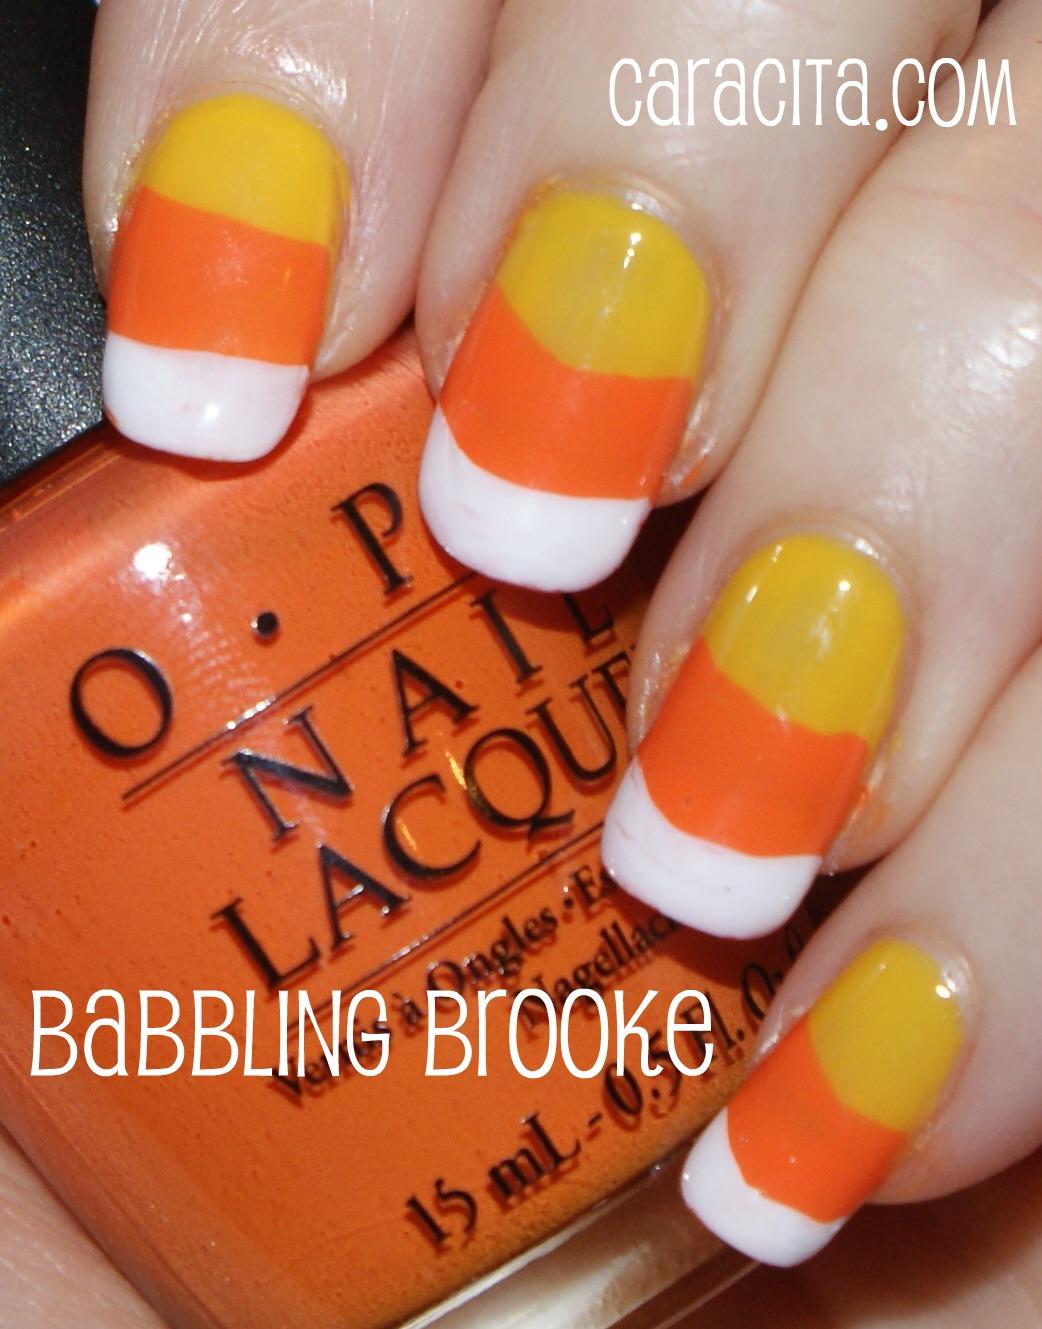 http://1.bp.blogspot.com/_GjZypFv554U/TMBKuZ3WAMI/AAAAAAAAFN8/TeXUjdcZGd4/s1600/Candy+Corn+Nails.jpg